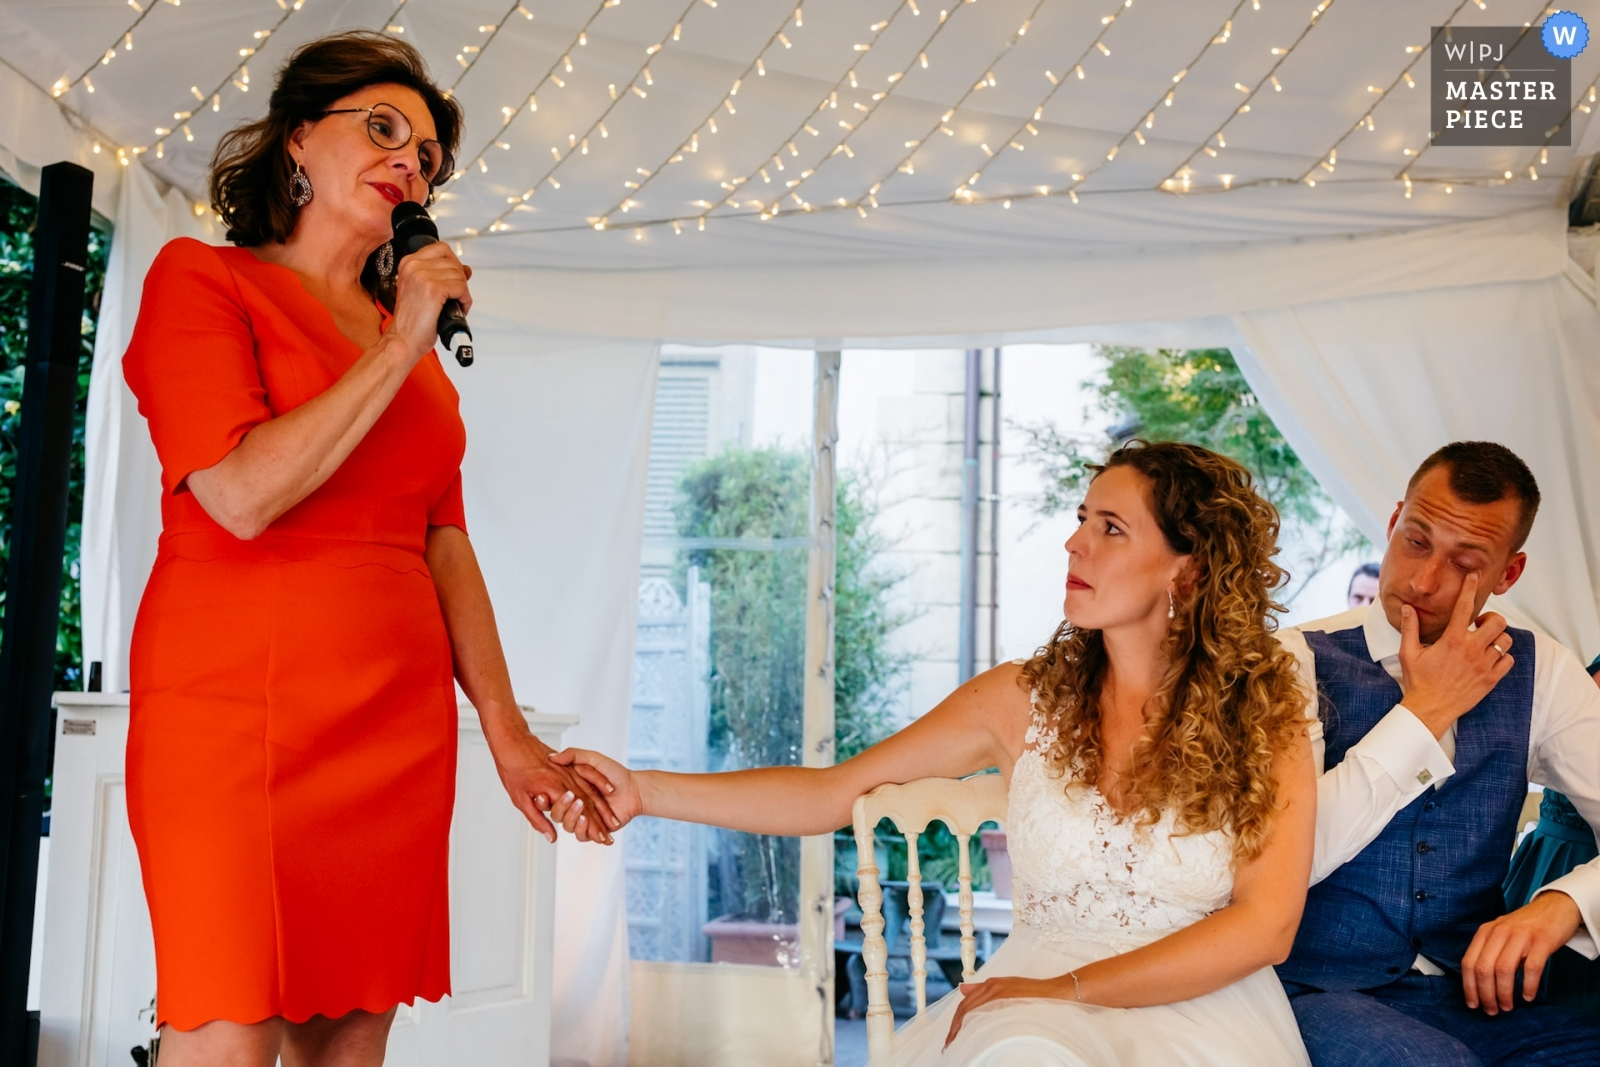 Wedding photo journalists association v5 2019